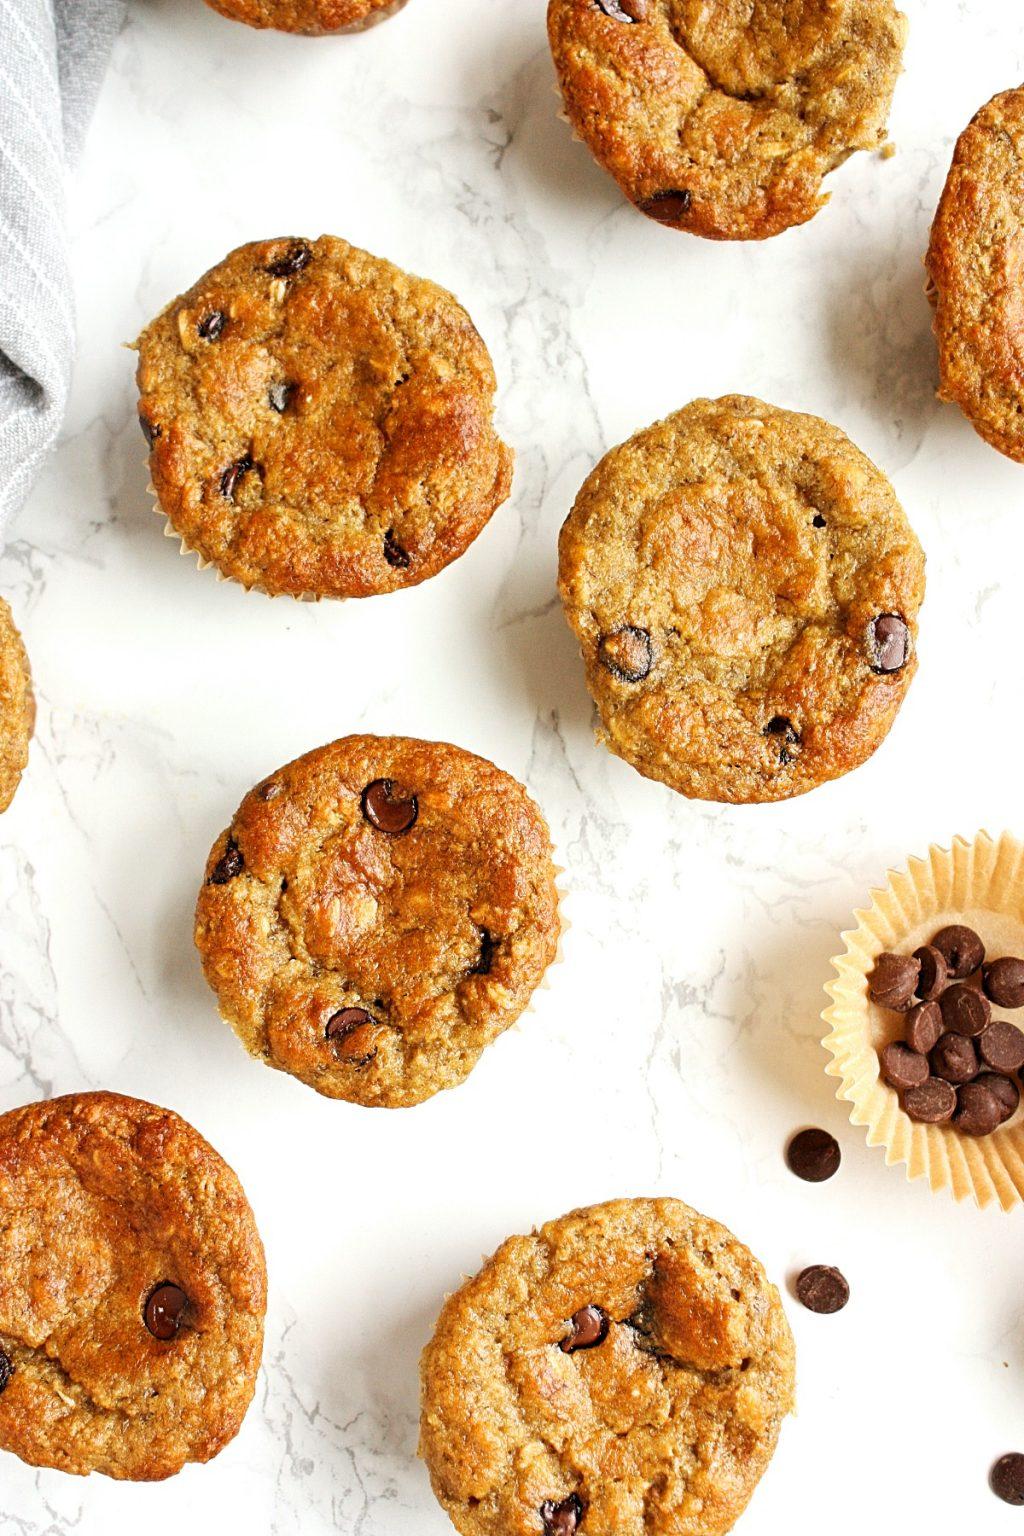 Gluten-Free Banana Muffins with Chocolate Chips